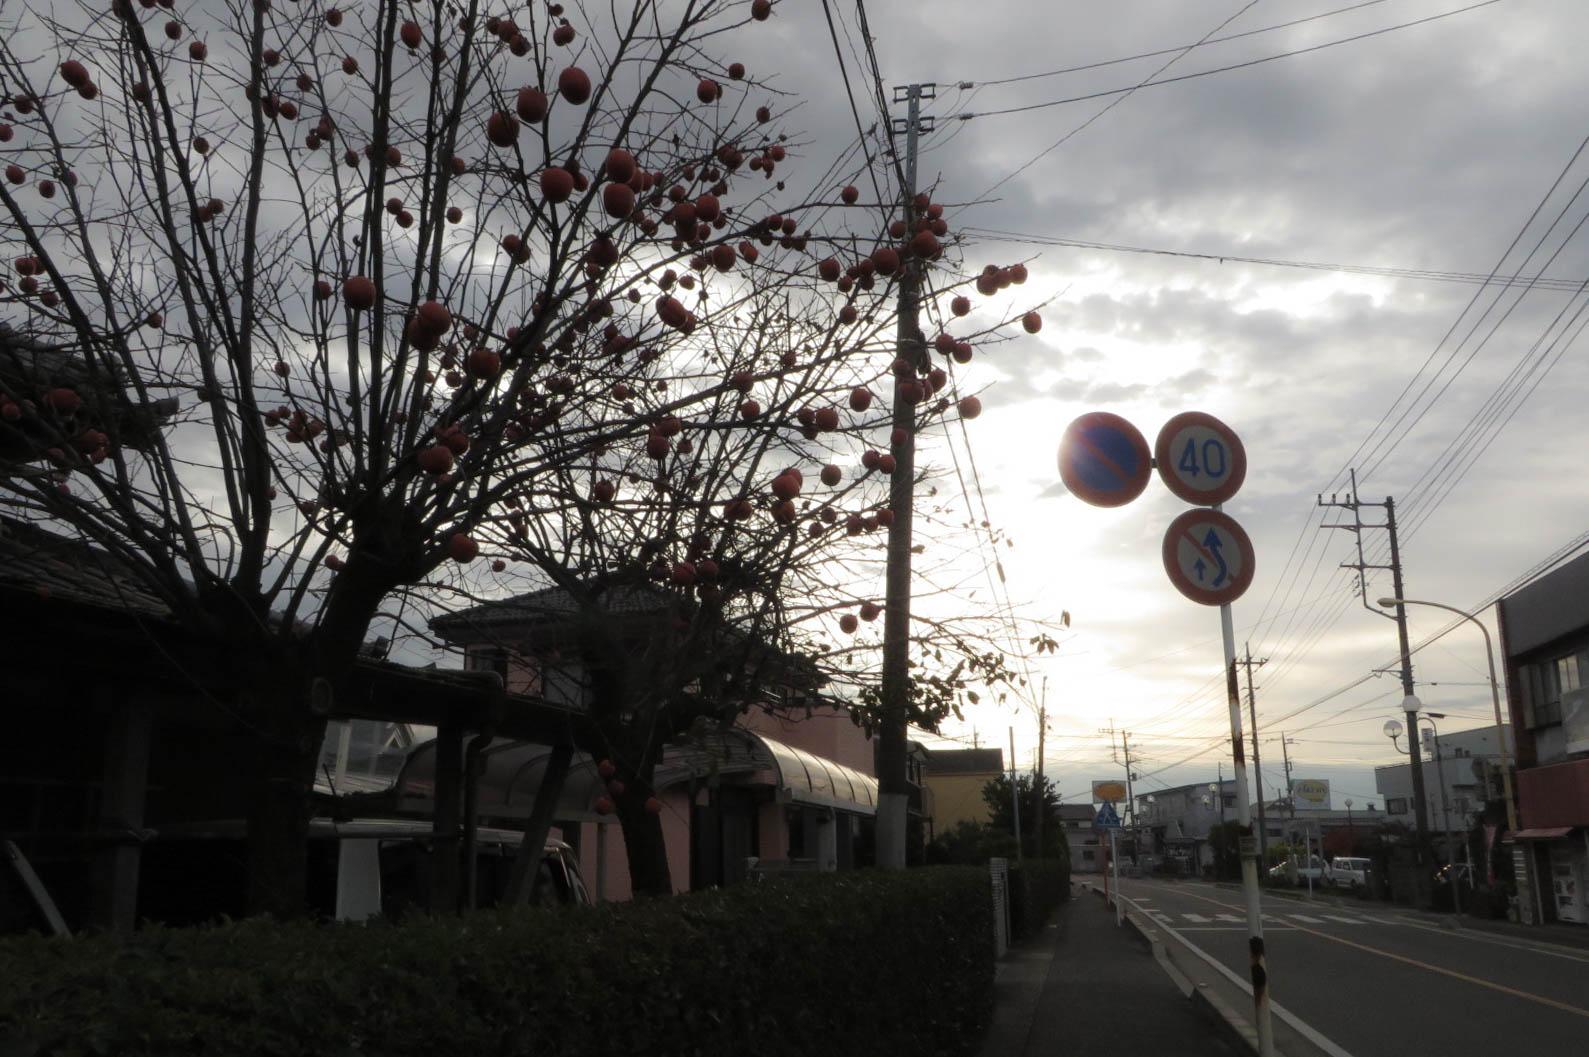 20141204_CanonSX280HS-2.jpg